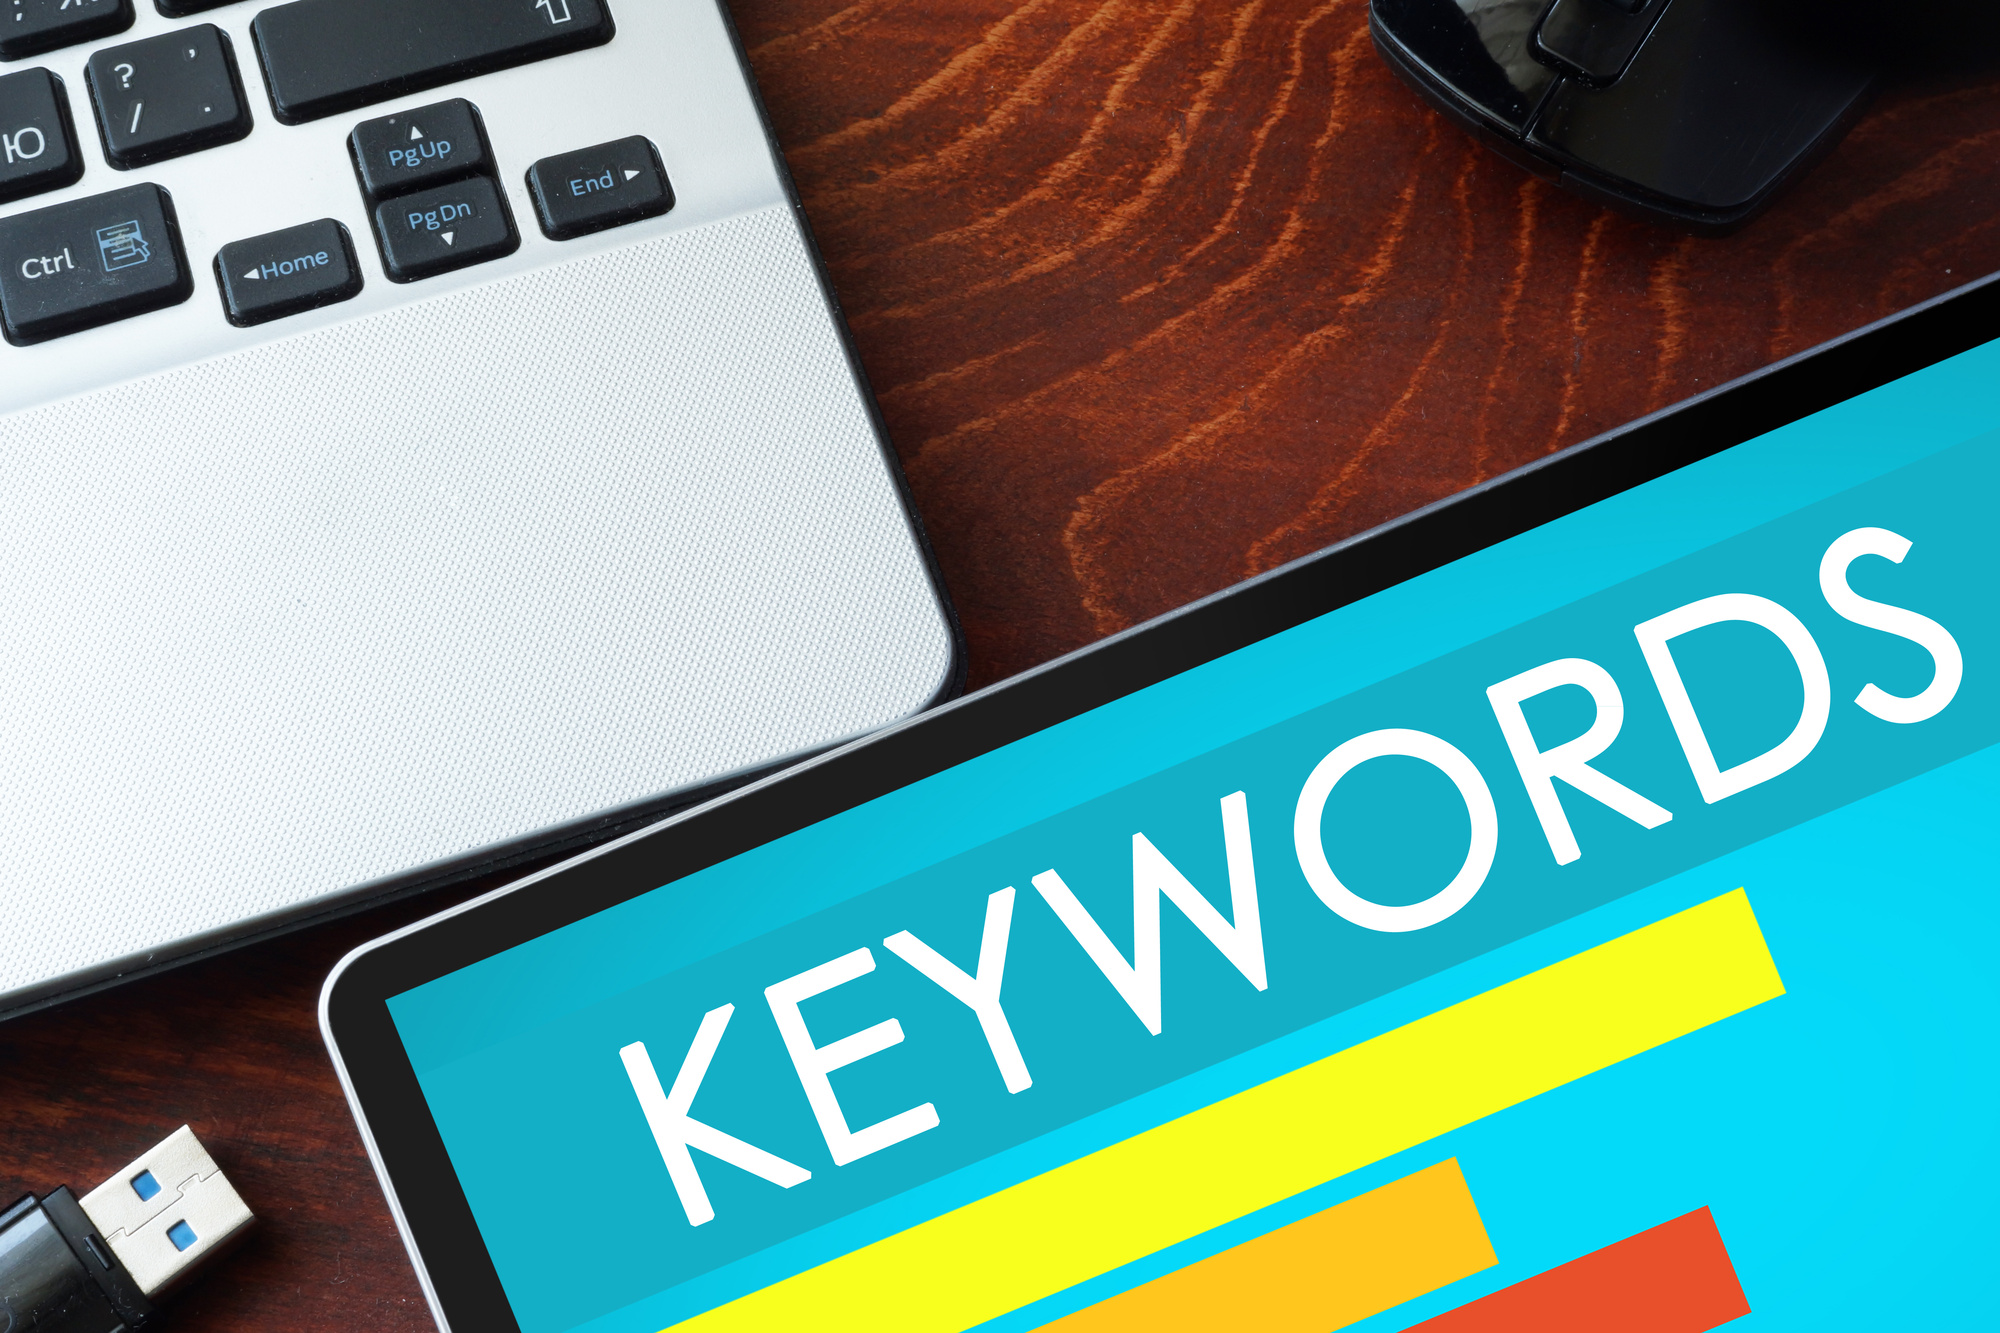 keywords on tablet screen